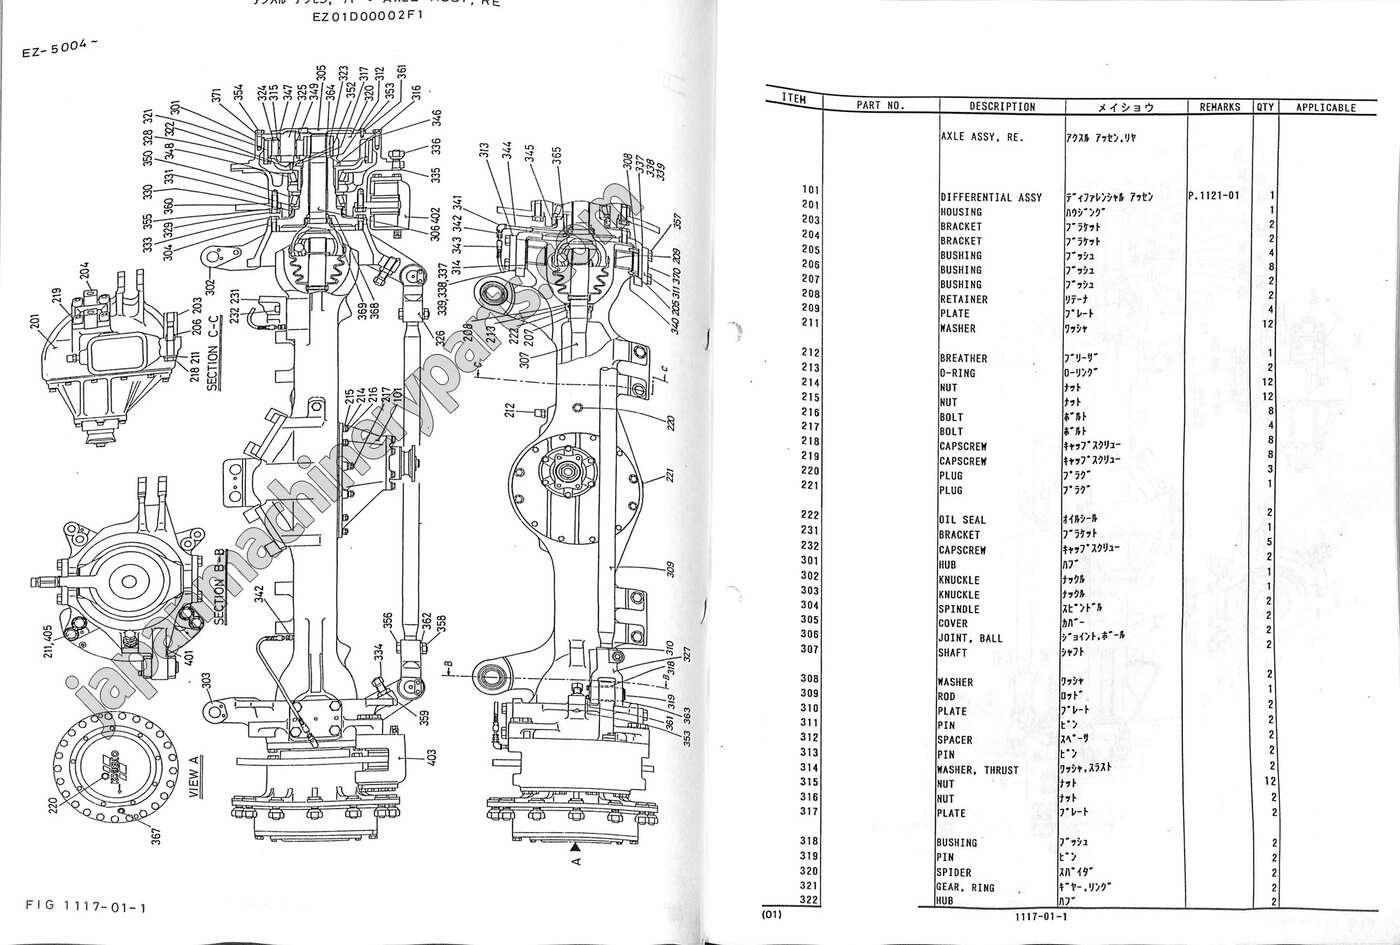 20f90 kobelco sk 120lc wiring diagrams wiring resources wiring a non-computer 700r4 kobelco wiring diagram #14